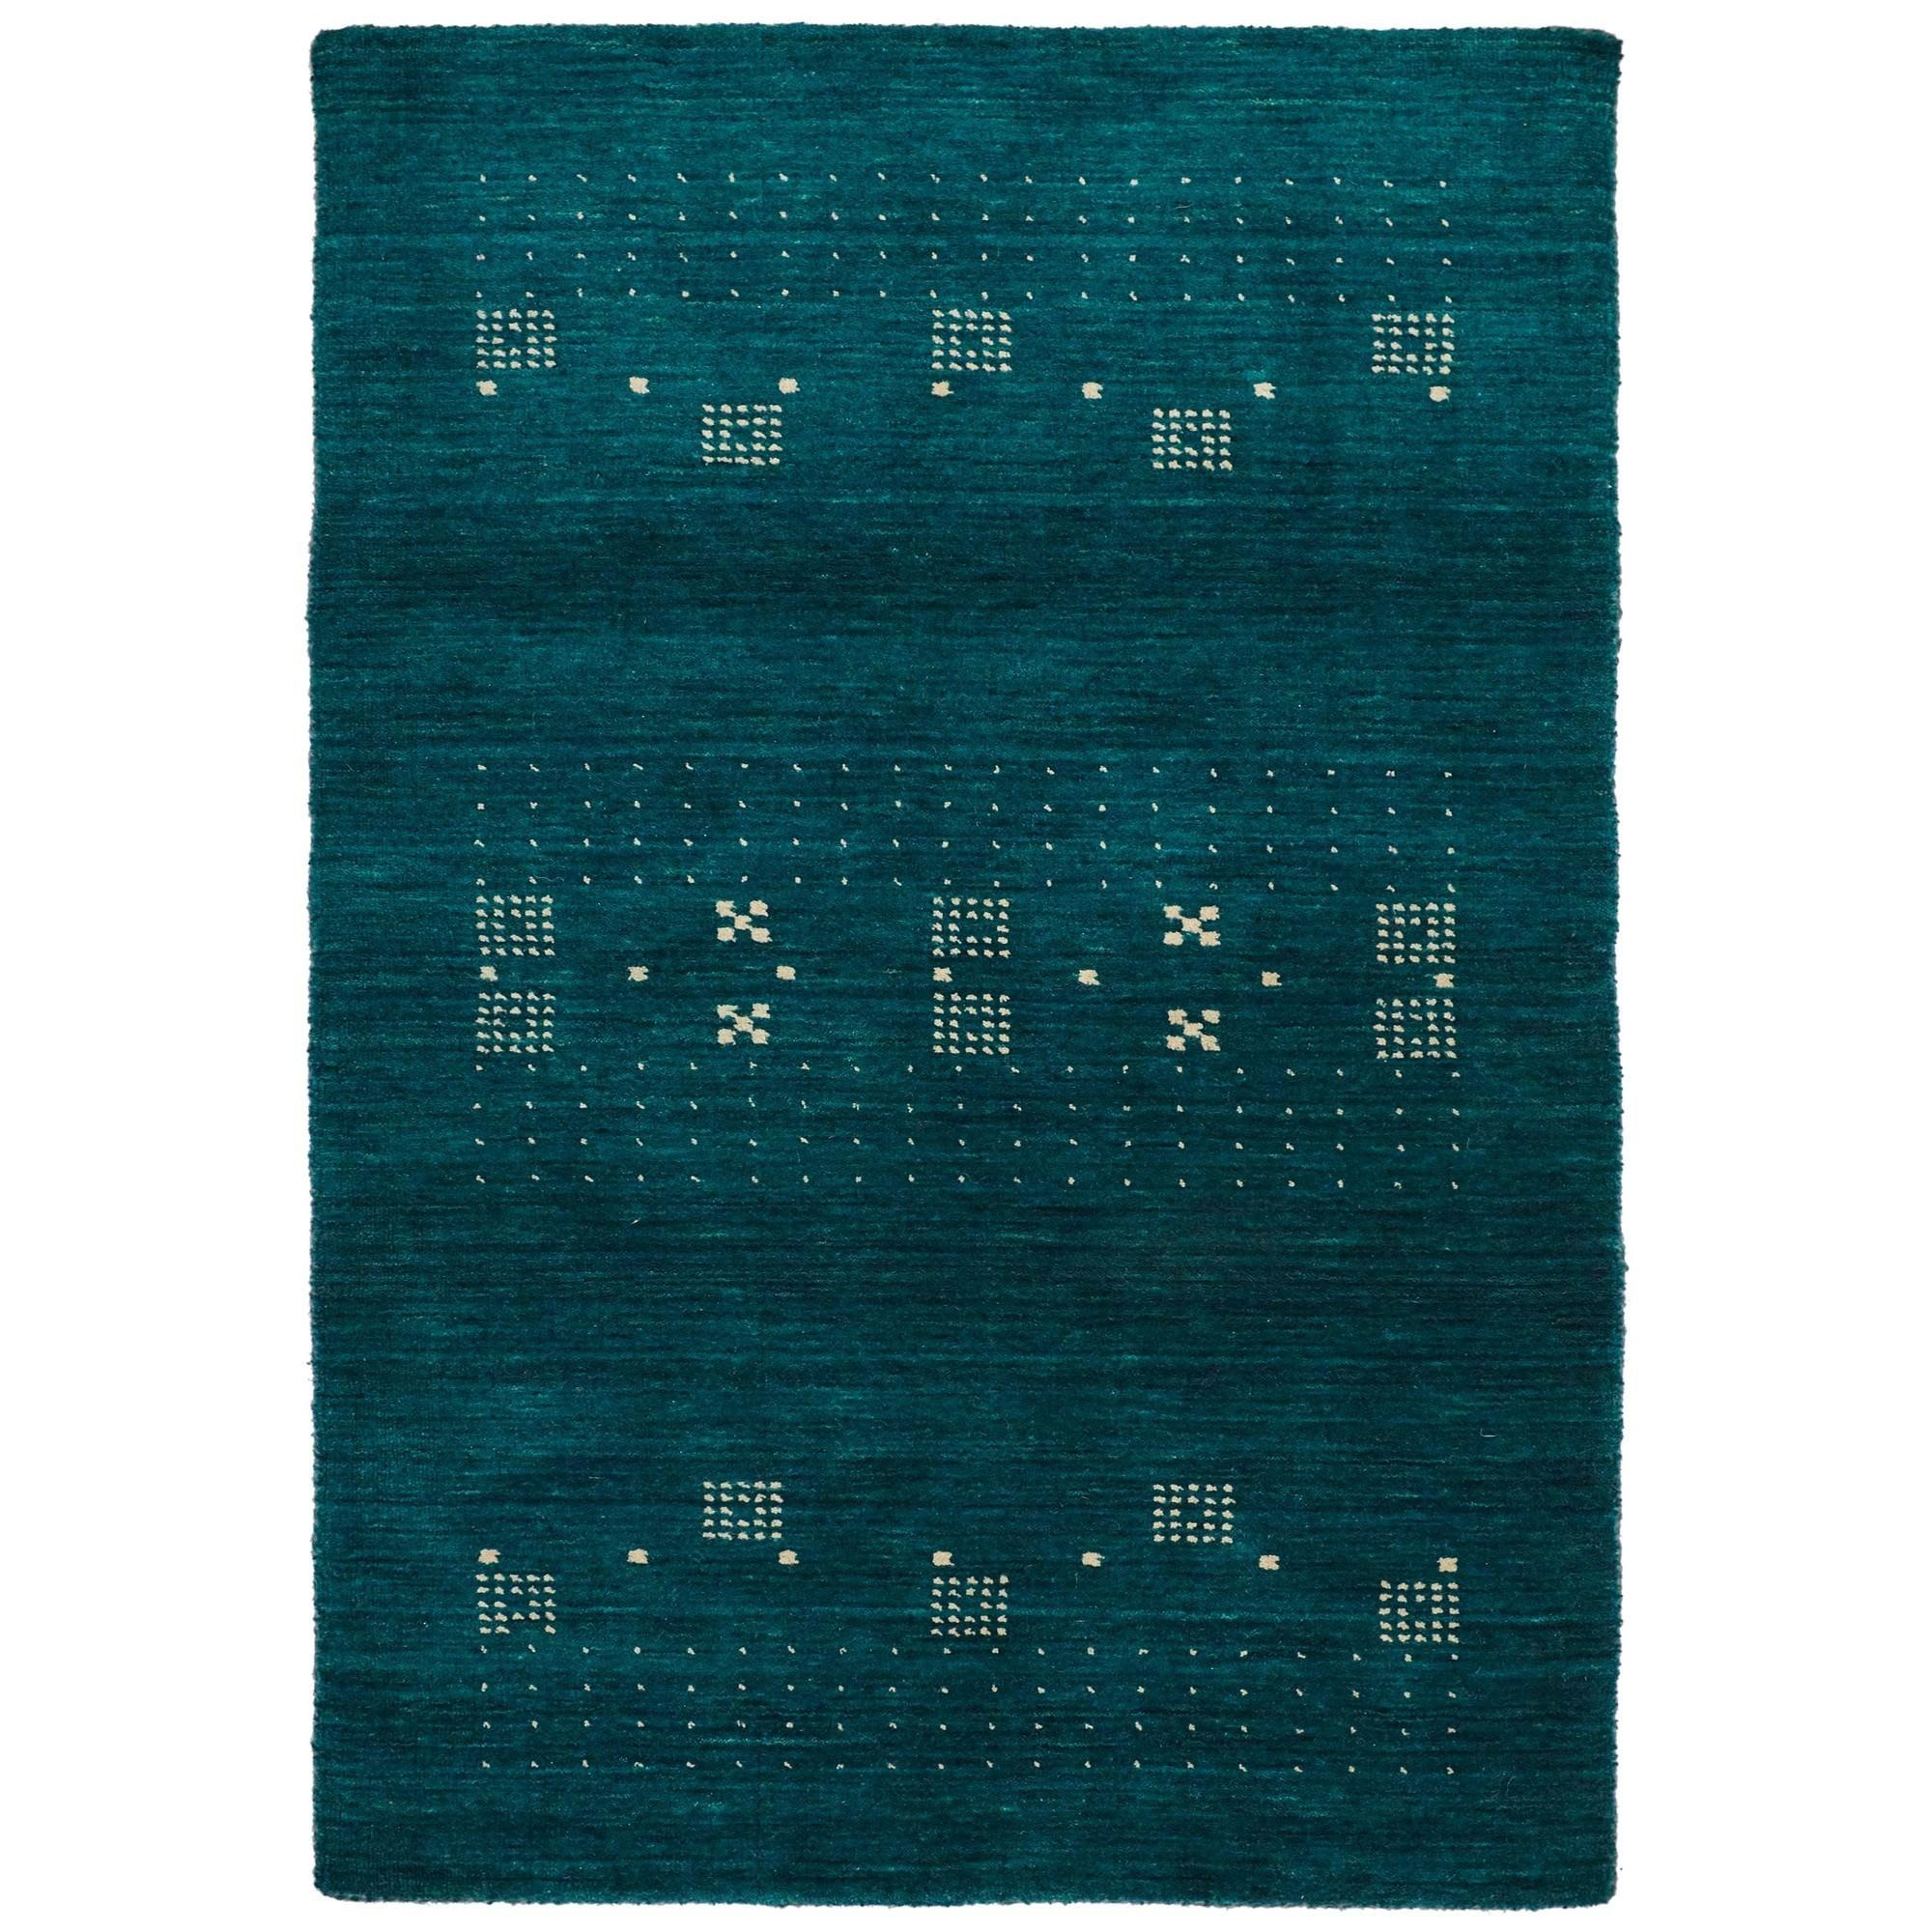 Lori No.042 Wool Tribal Rug, 130x70cm, Turquoise